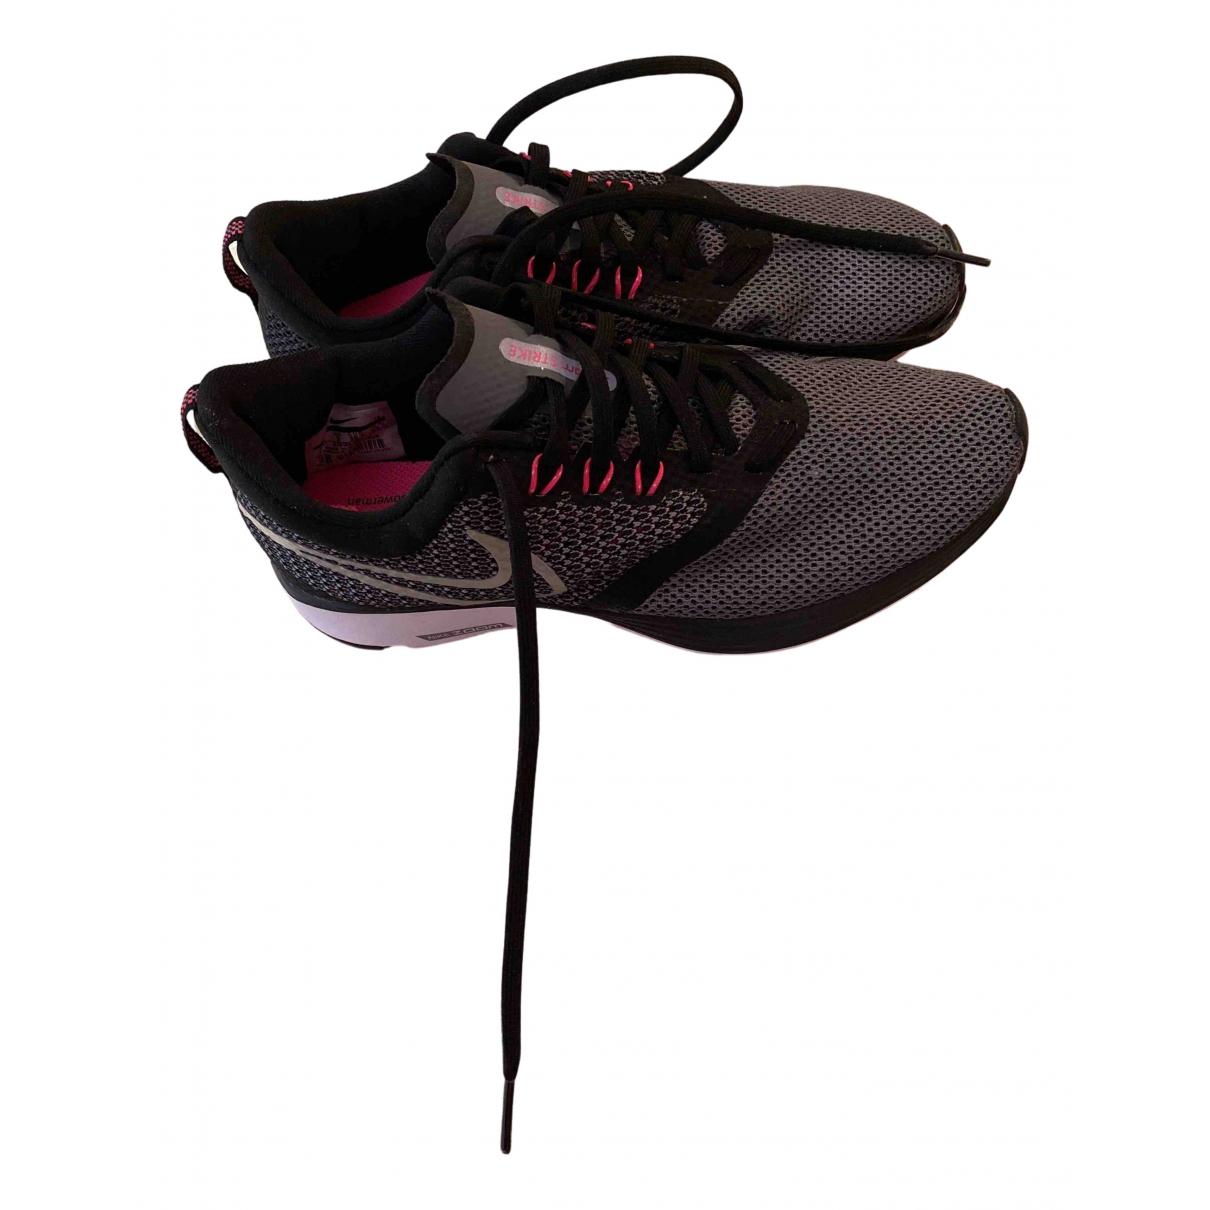 Nike Zoom Black Cloth Trainers for Women 38.5 EU